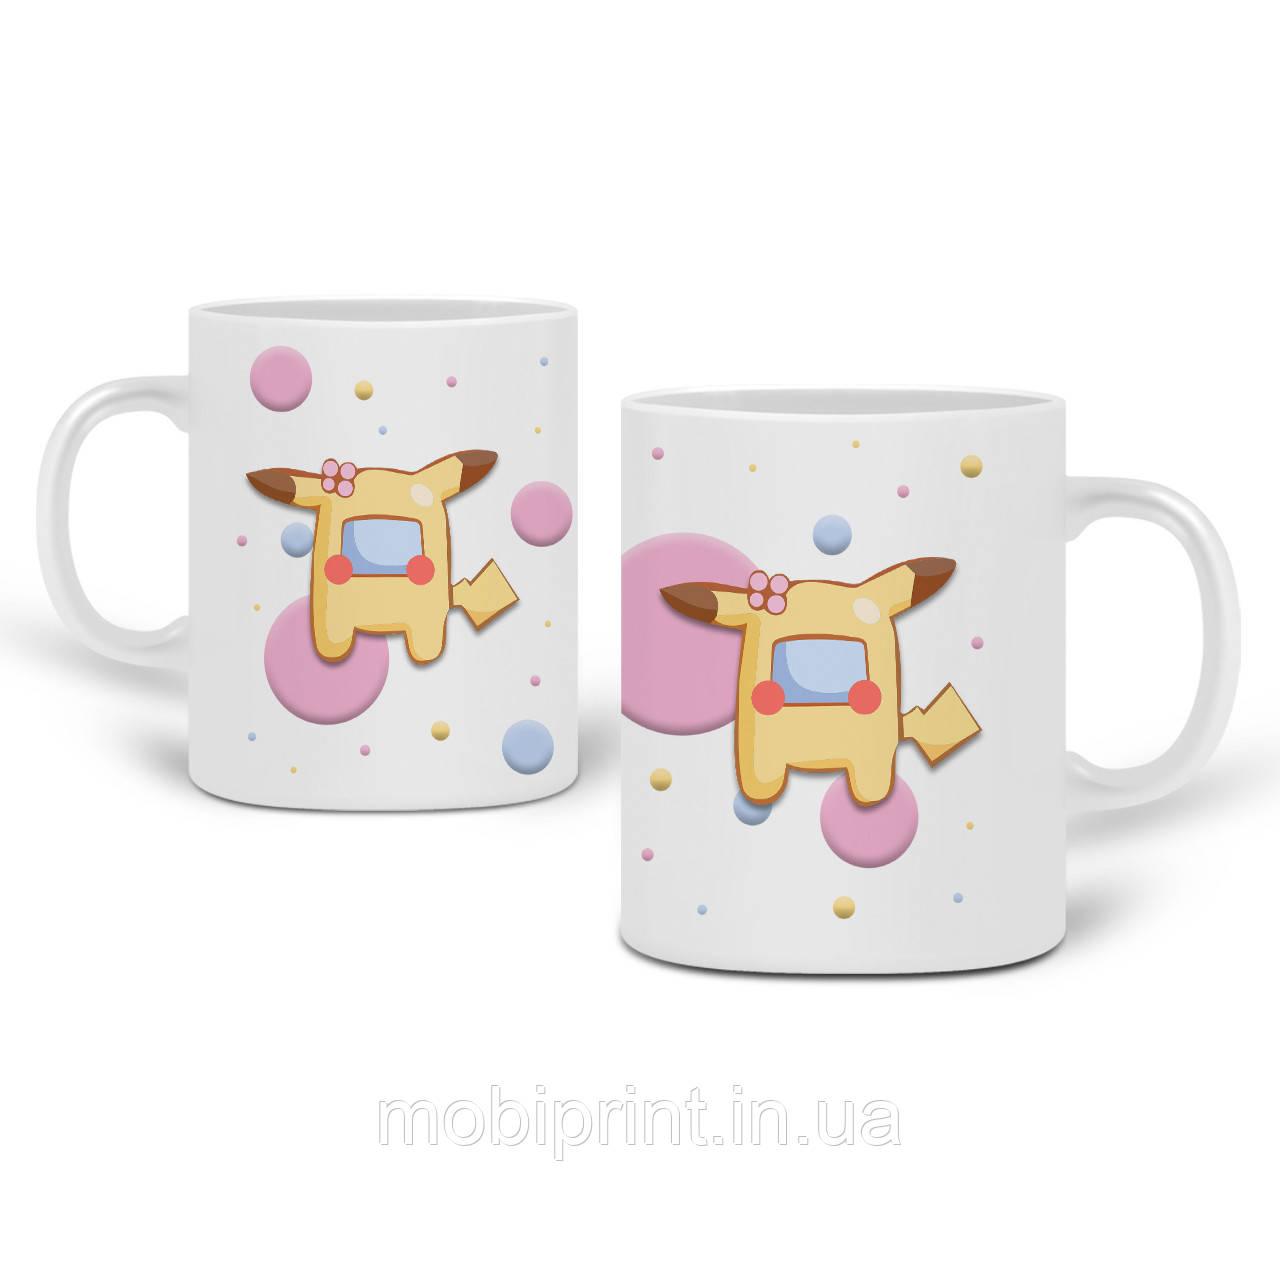 Кружка Амонг Ас Покемон Пикачу (Among Us Pokemon Pikachu) 330 мл Чашка Керамическая (20259-2419)